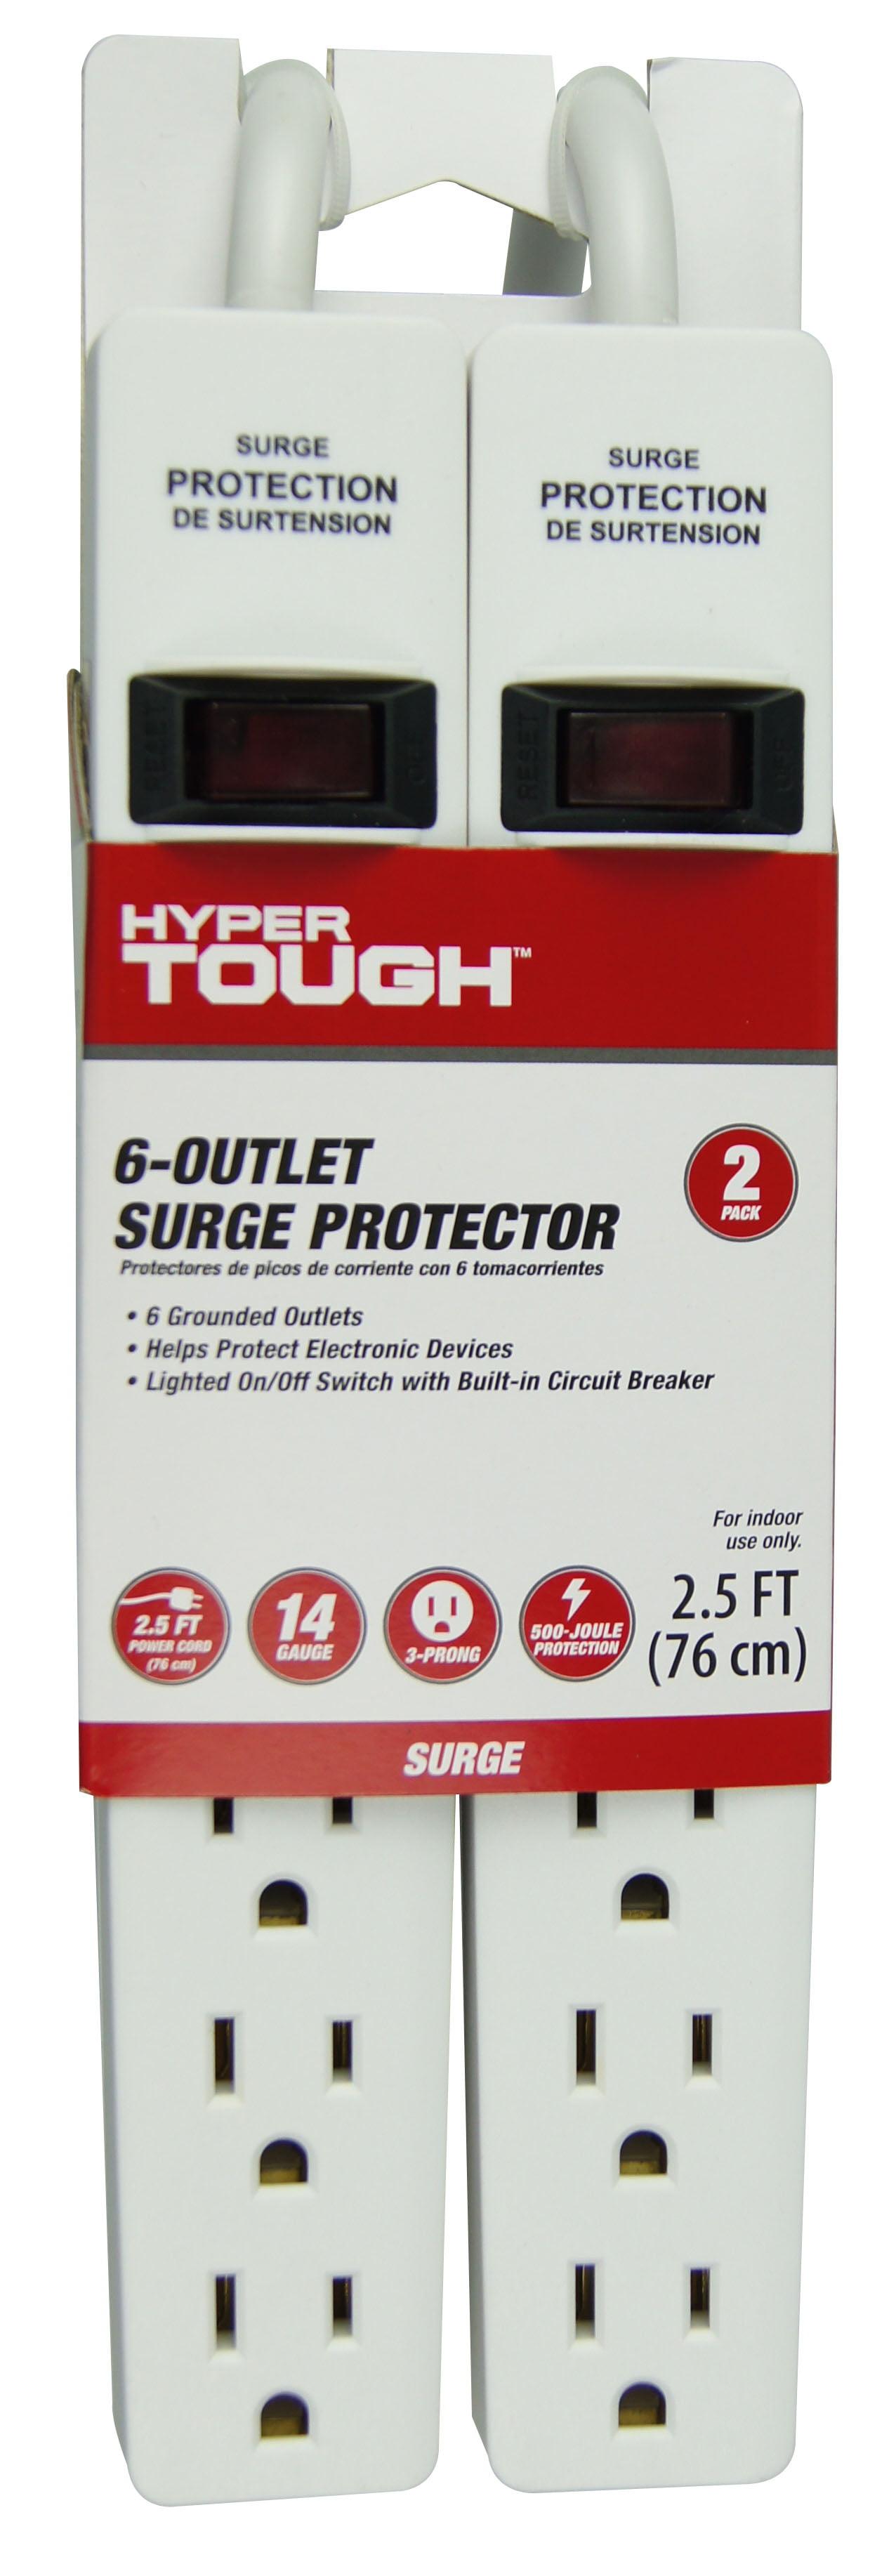 Hyper Tough 2 Pack 6-Outlet 2.5FT Surge Protector, White by KAB Enterprise Co., Ltd.